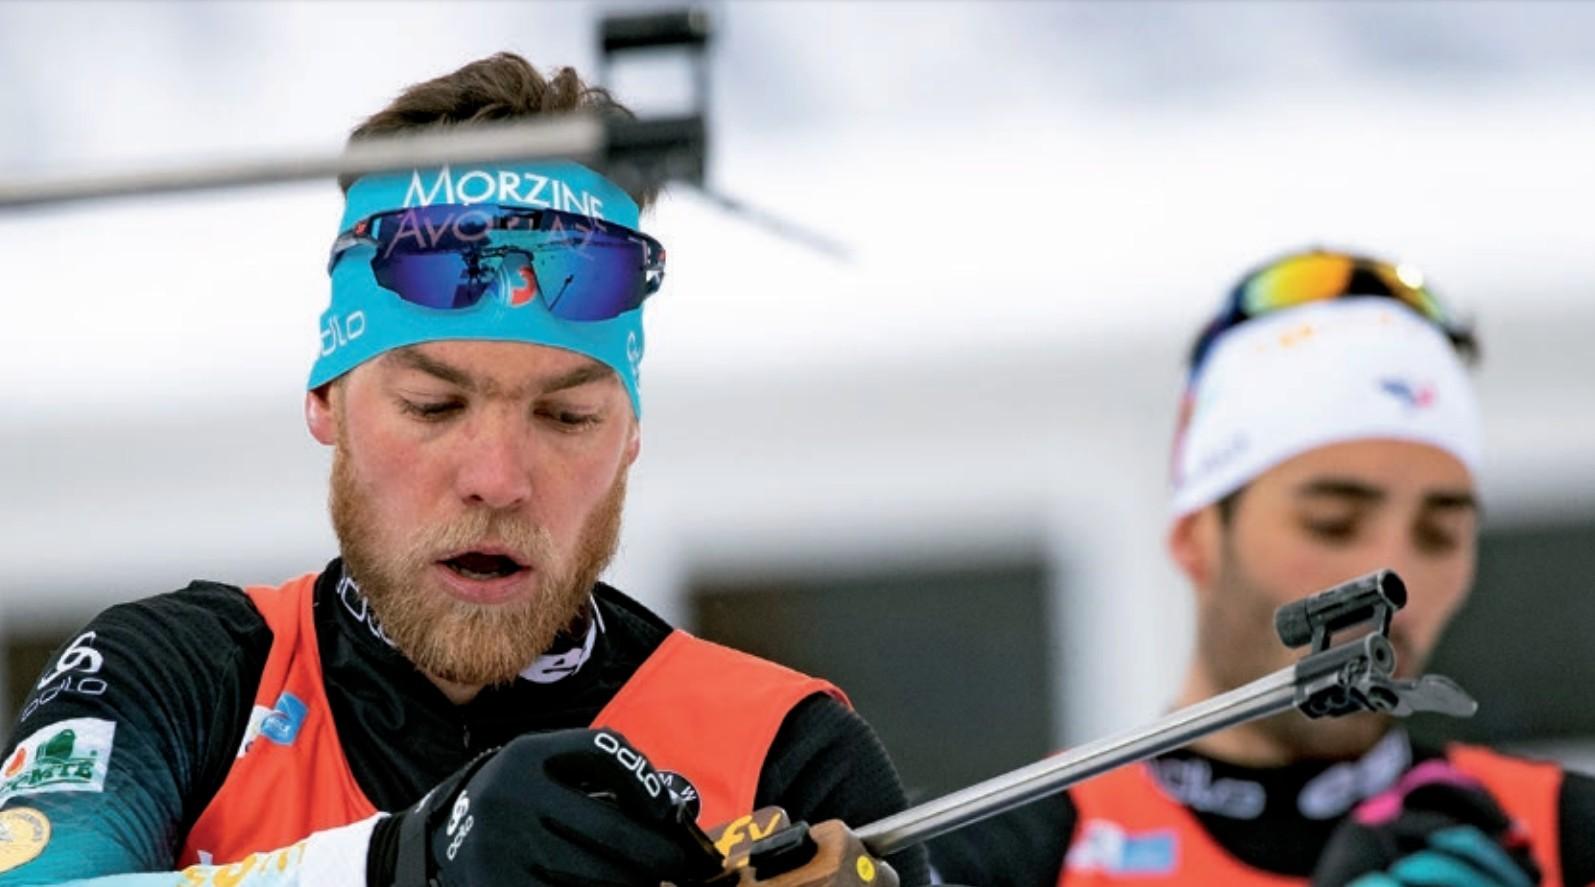 antnonin-guigonnat-champion-du-monde-de-biathlon-3915532